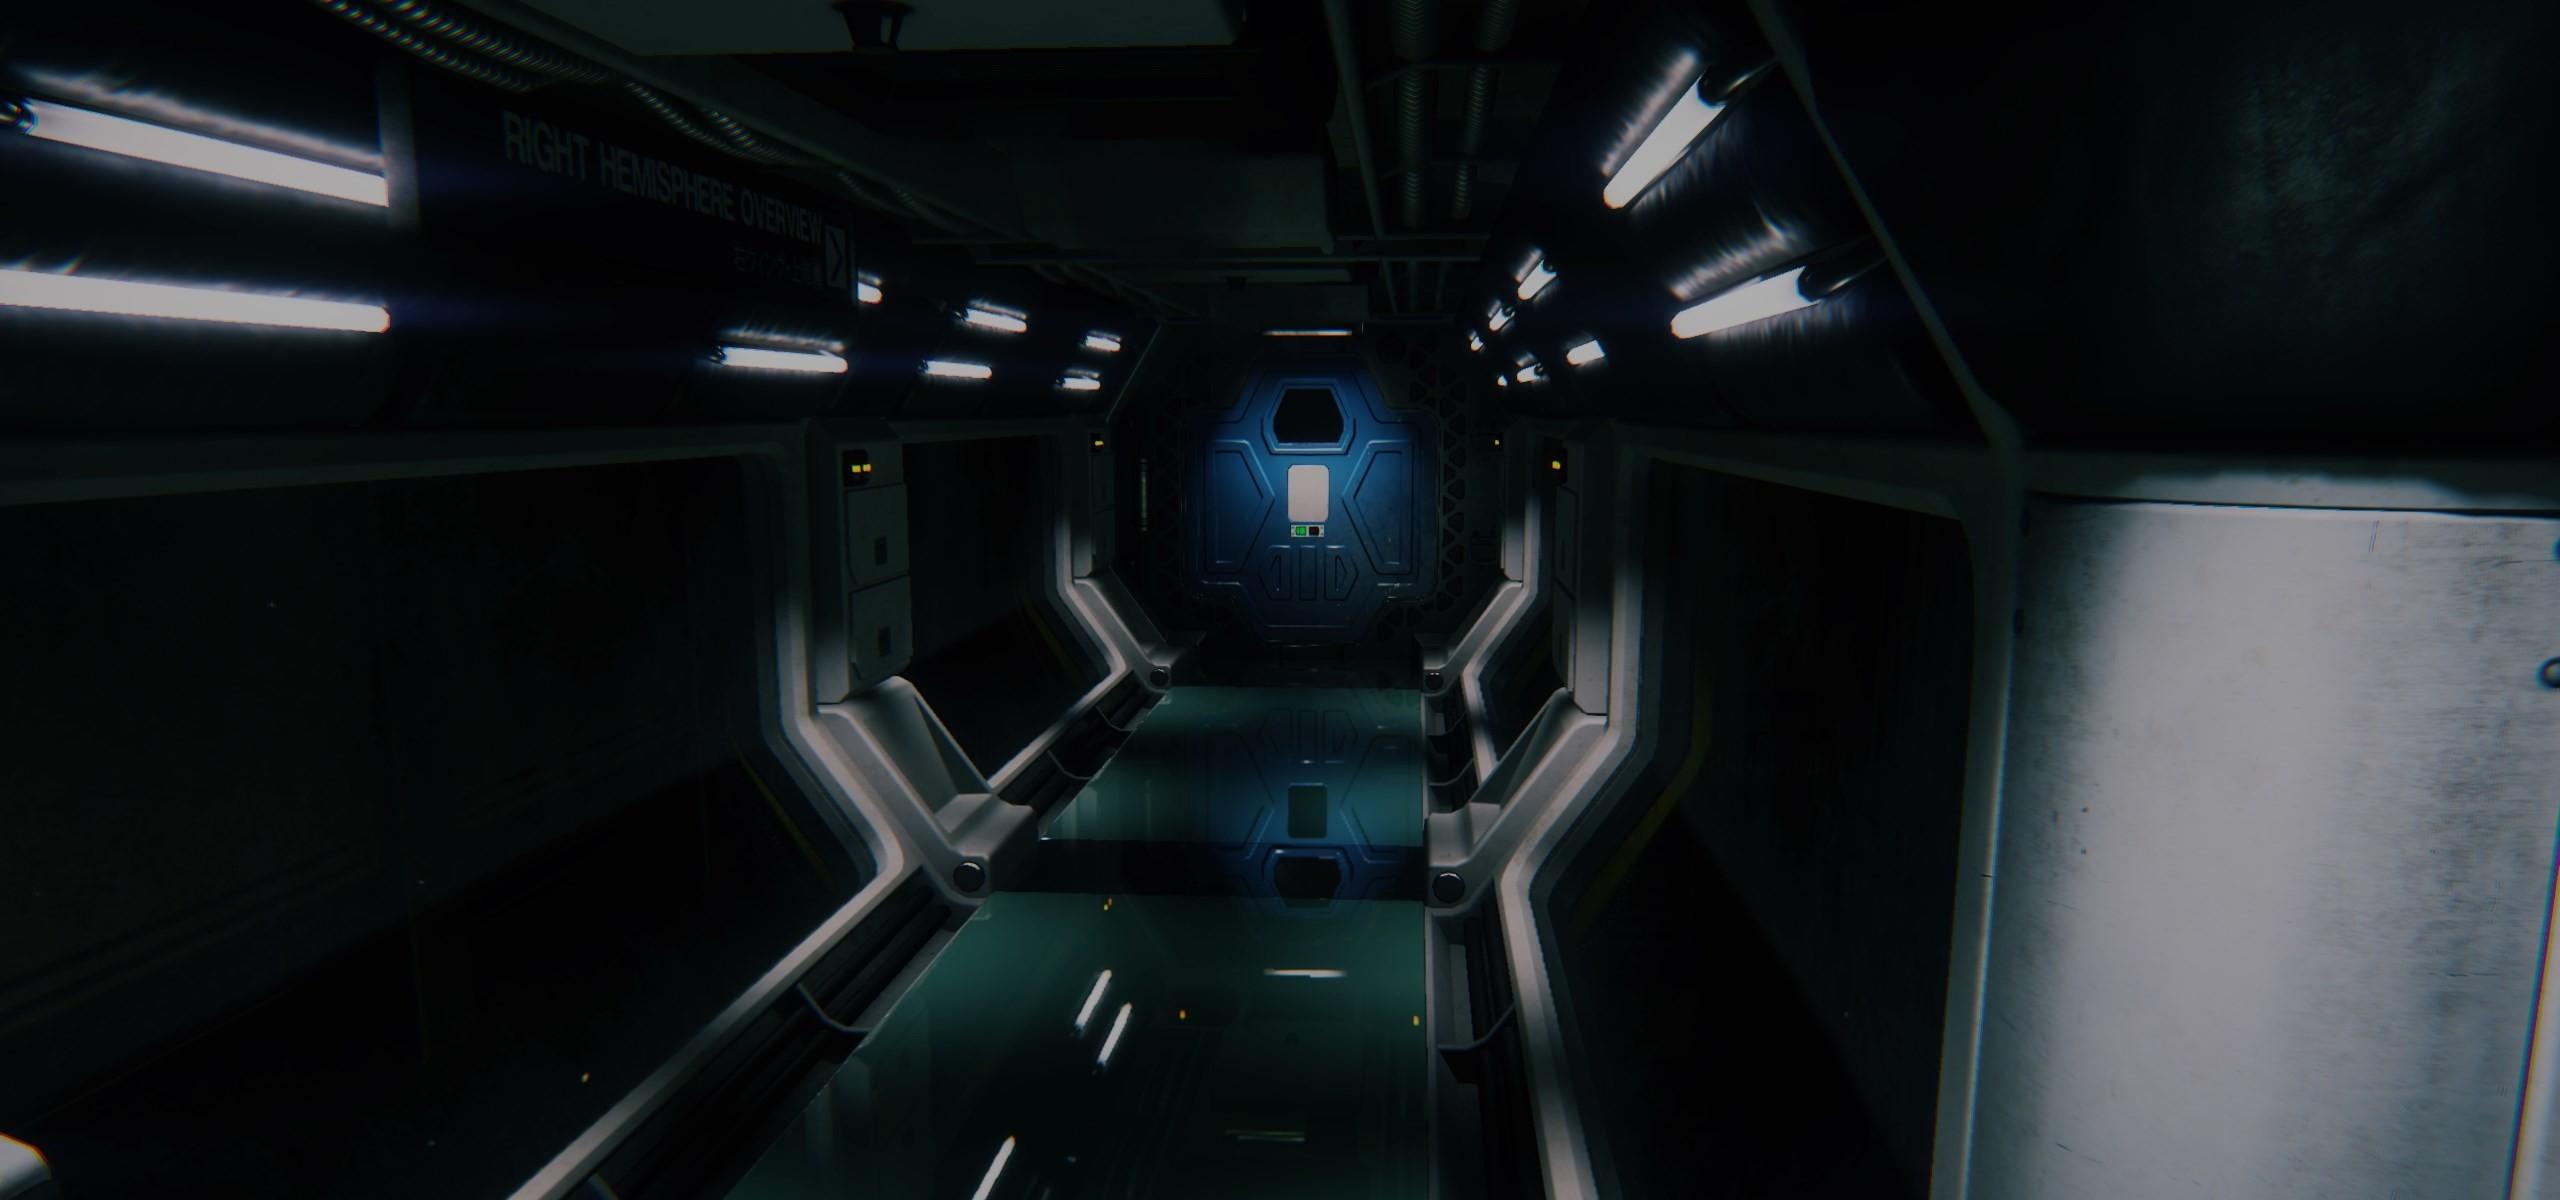 hd wallpaper alien isolation